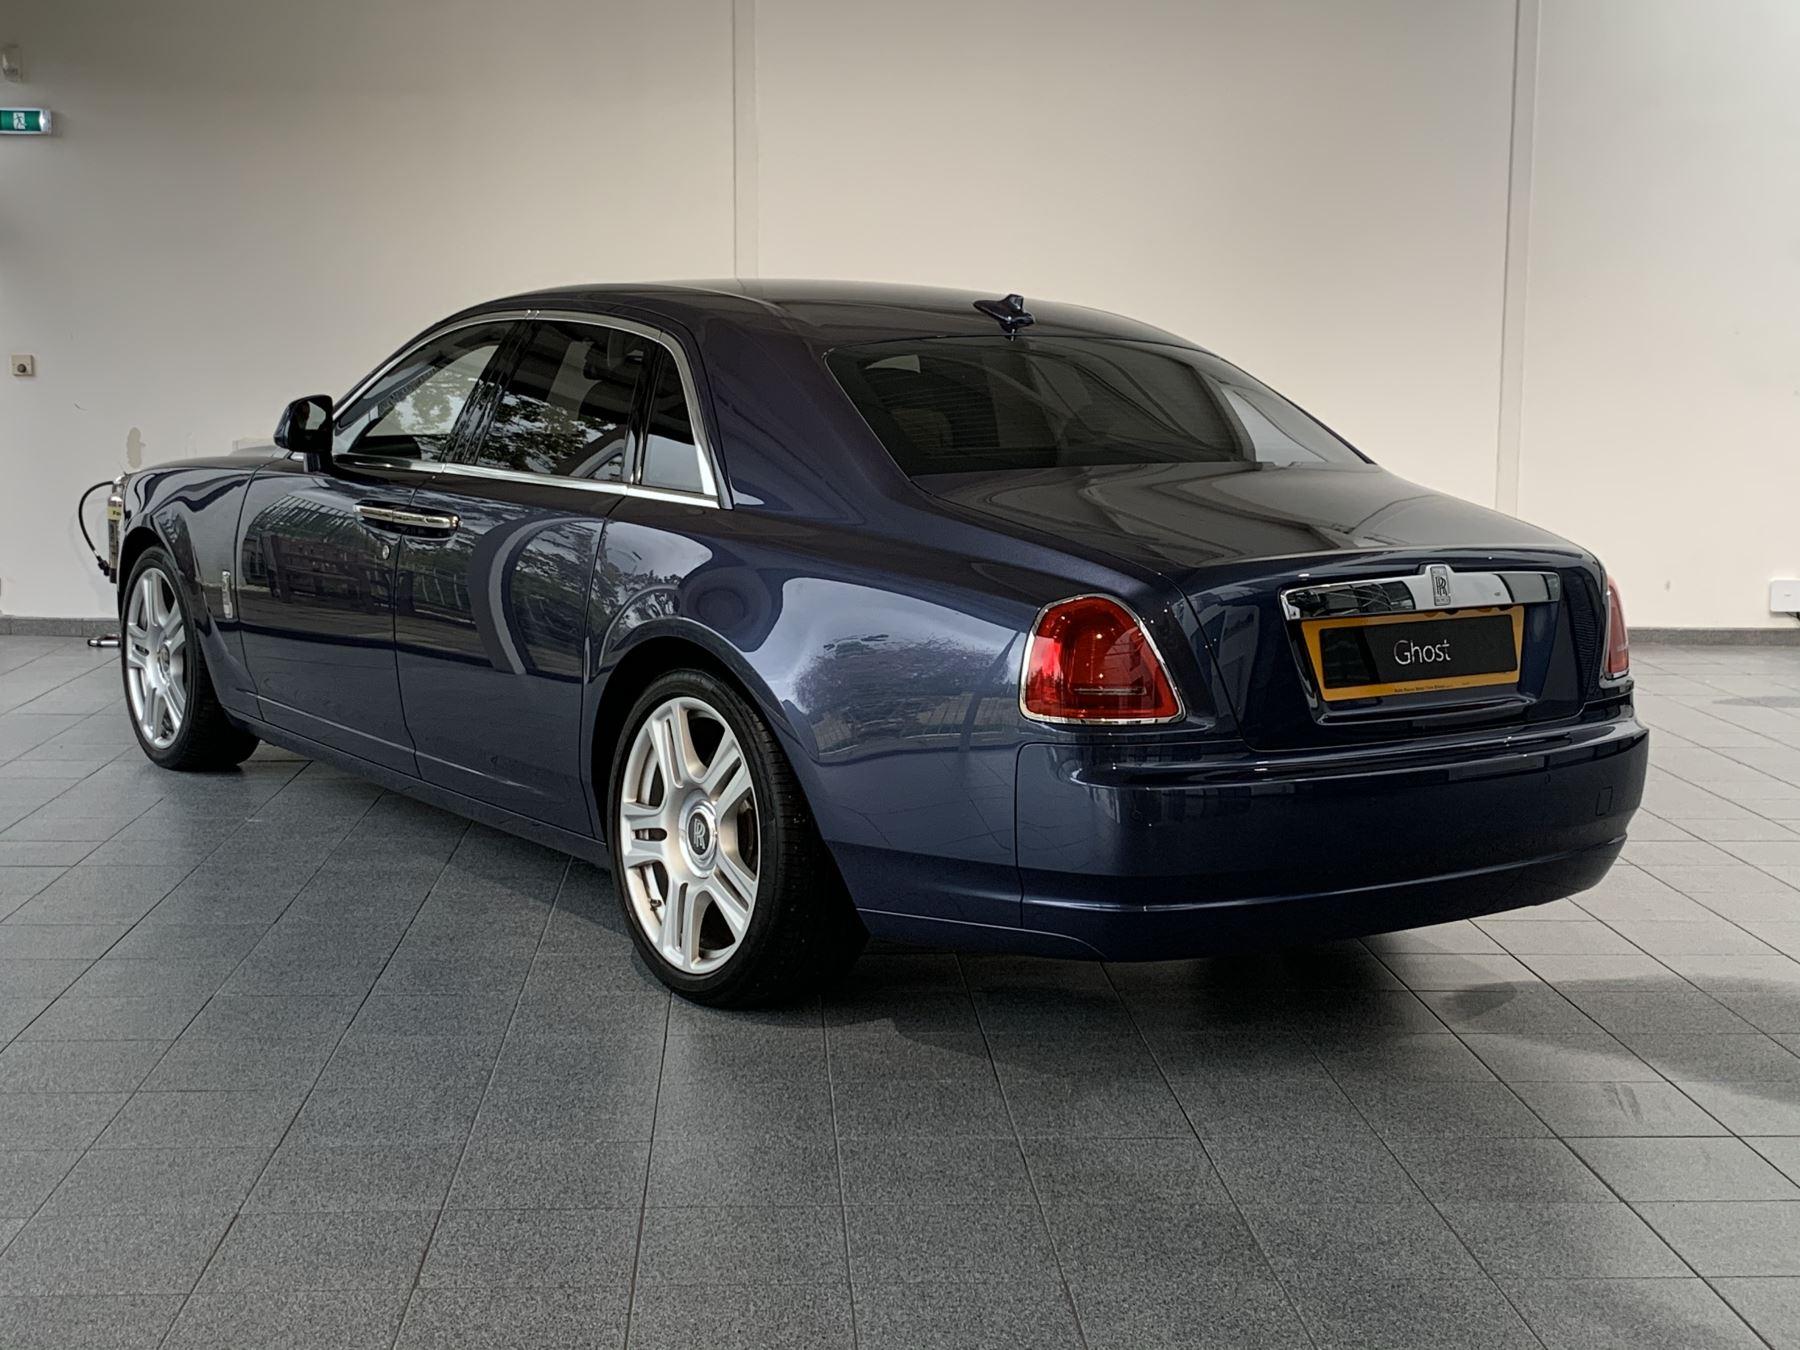 Rolls-Royce Ghost V12 AUTO image 3